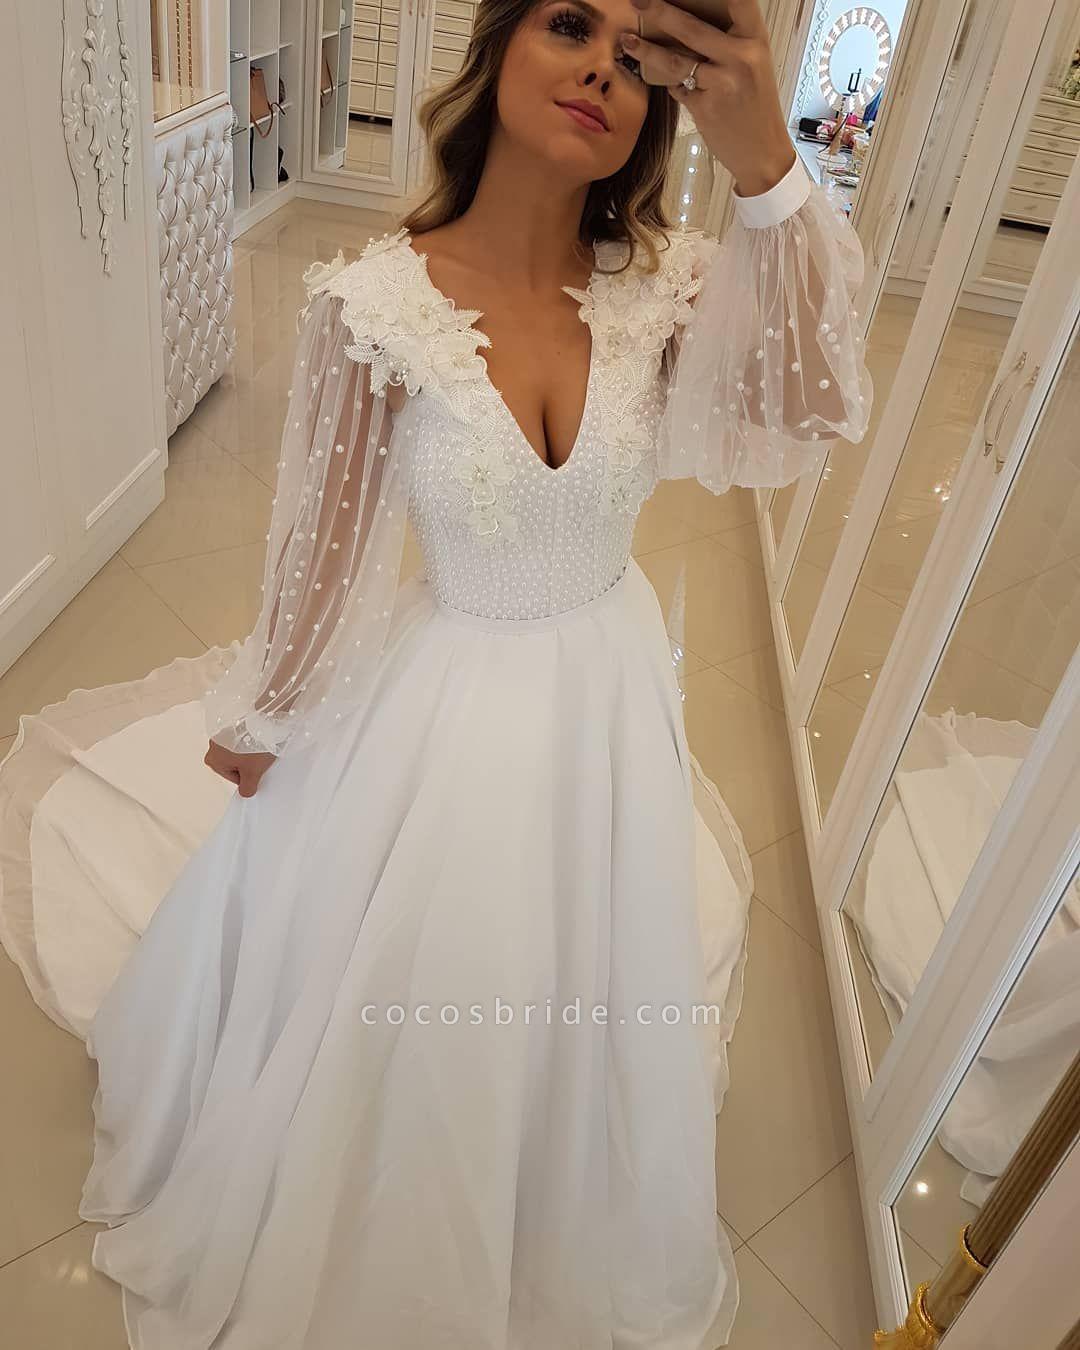 Fascinating V-neck Tulle A-line Prom Dress